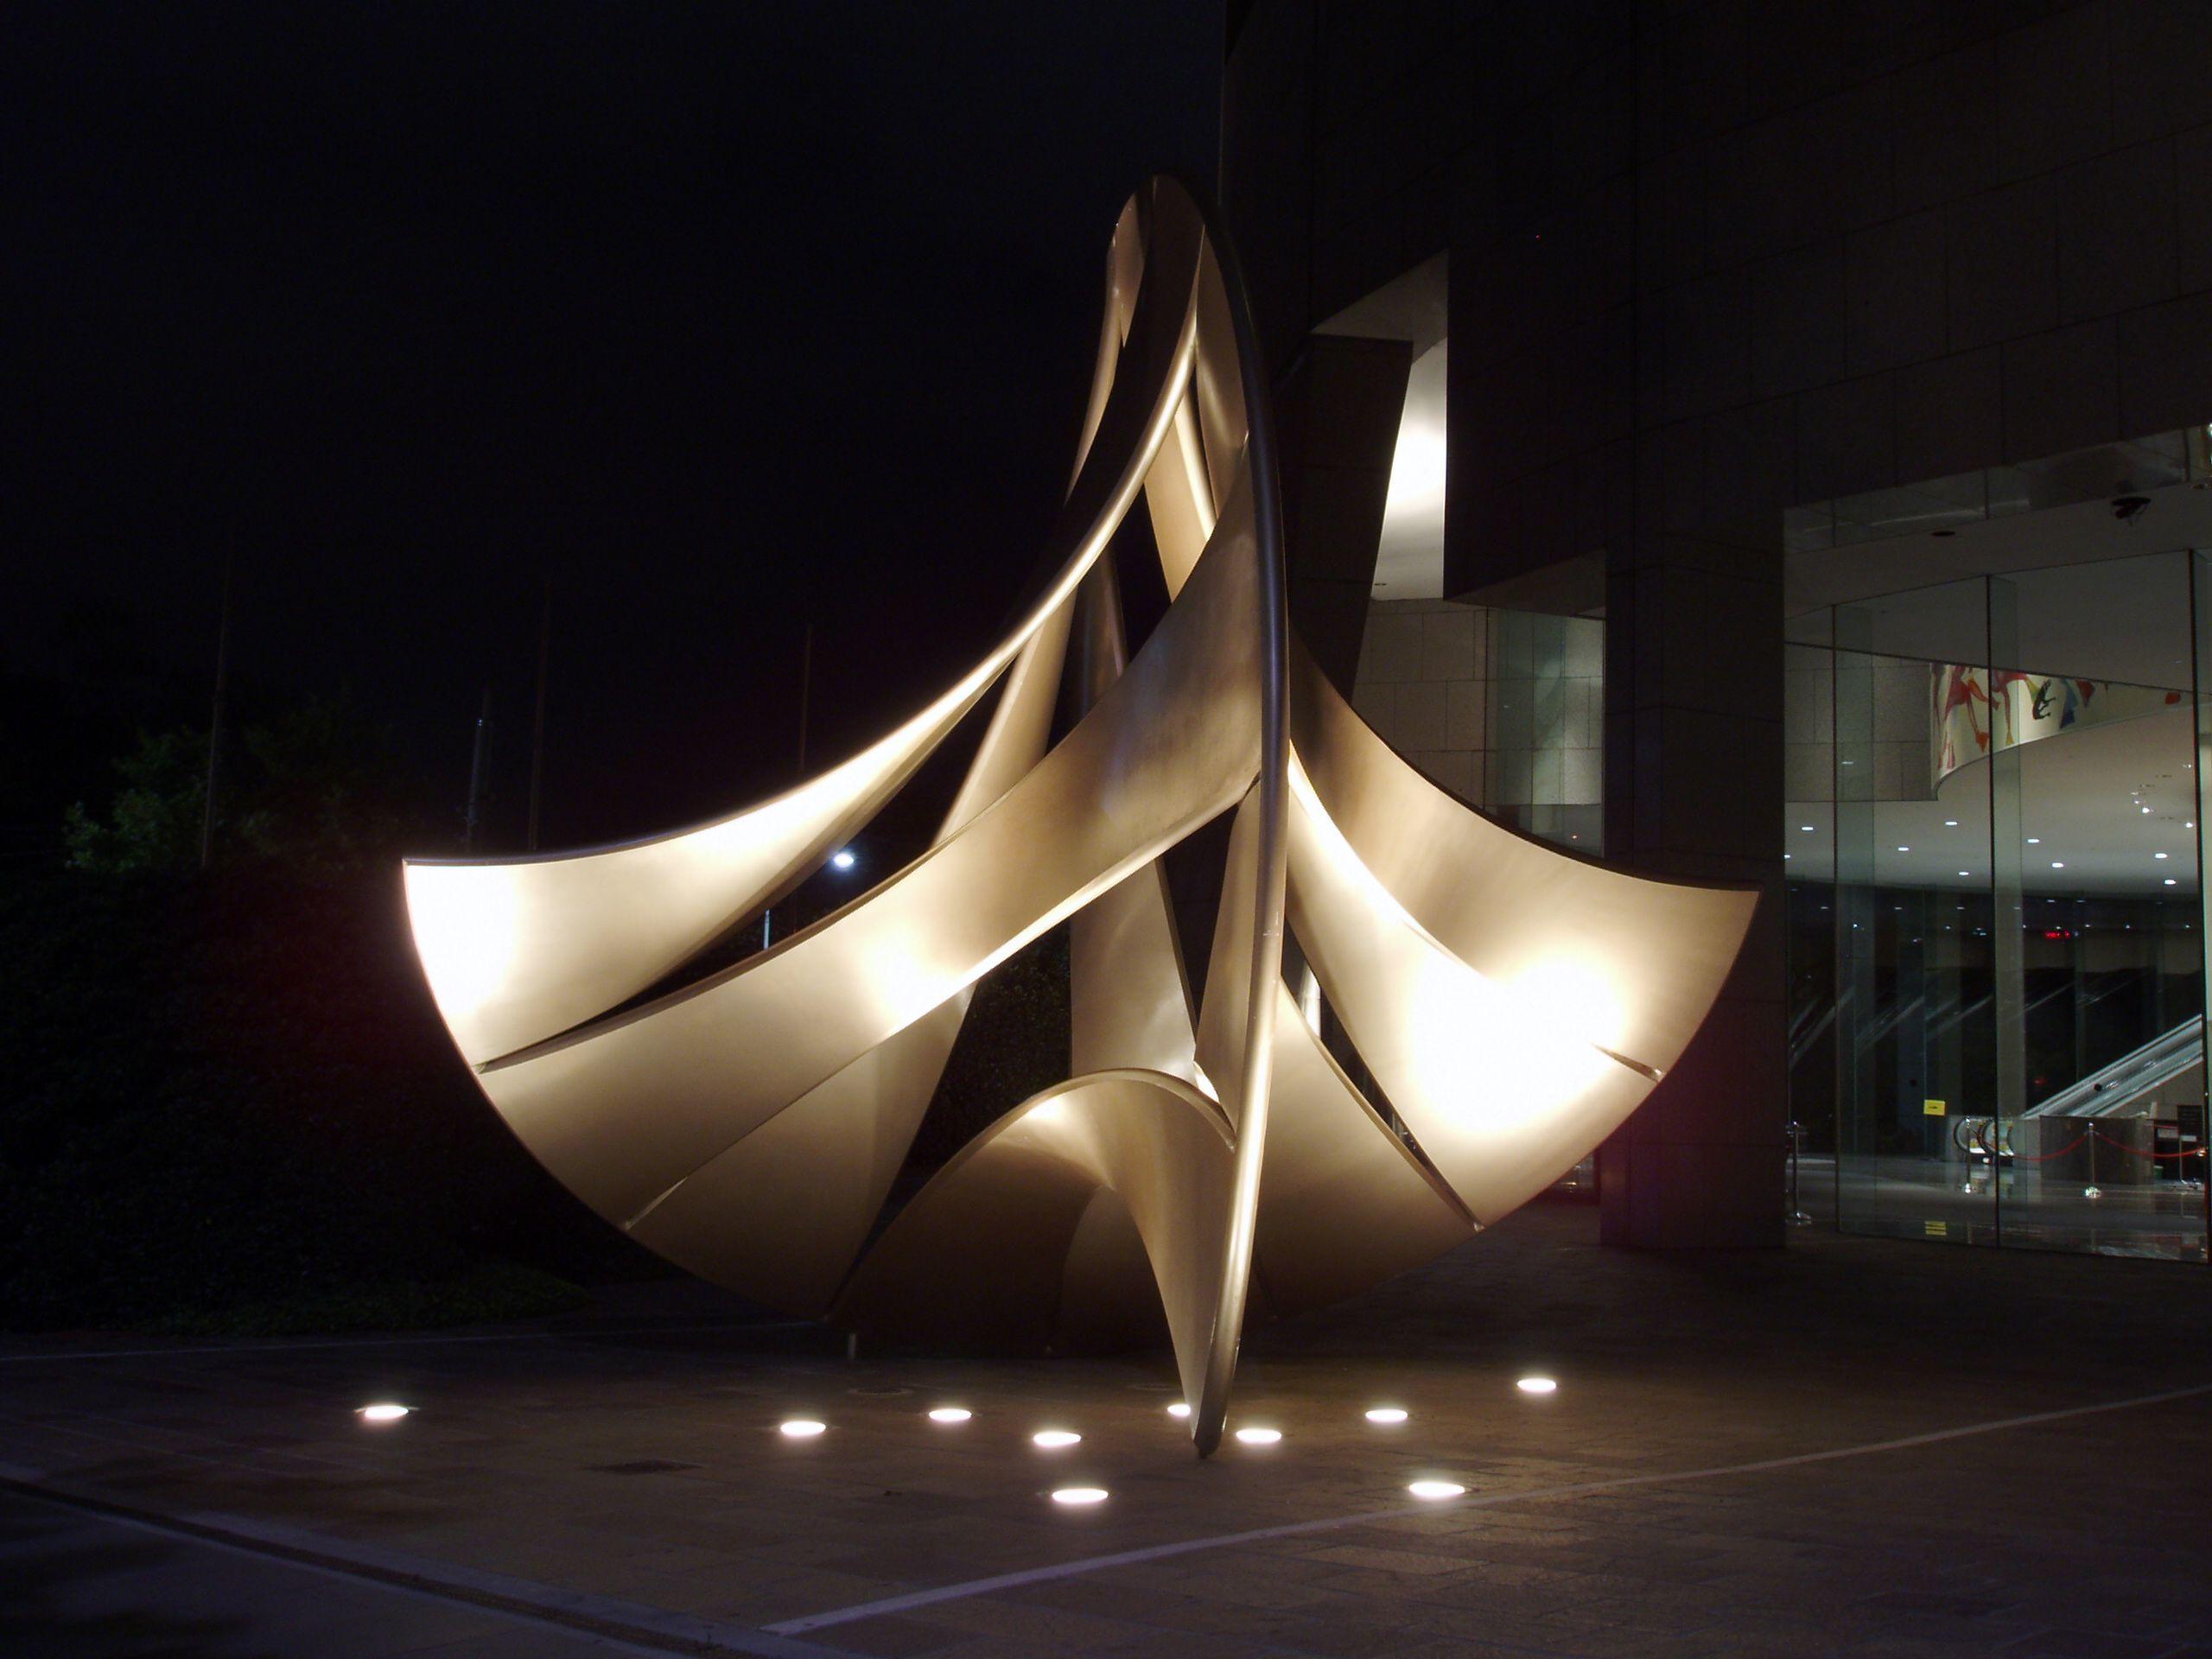 نورپردازی تاکیدی بر اثر هنری